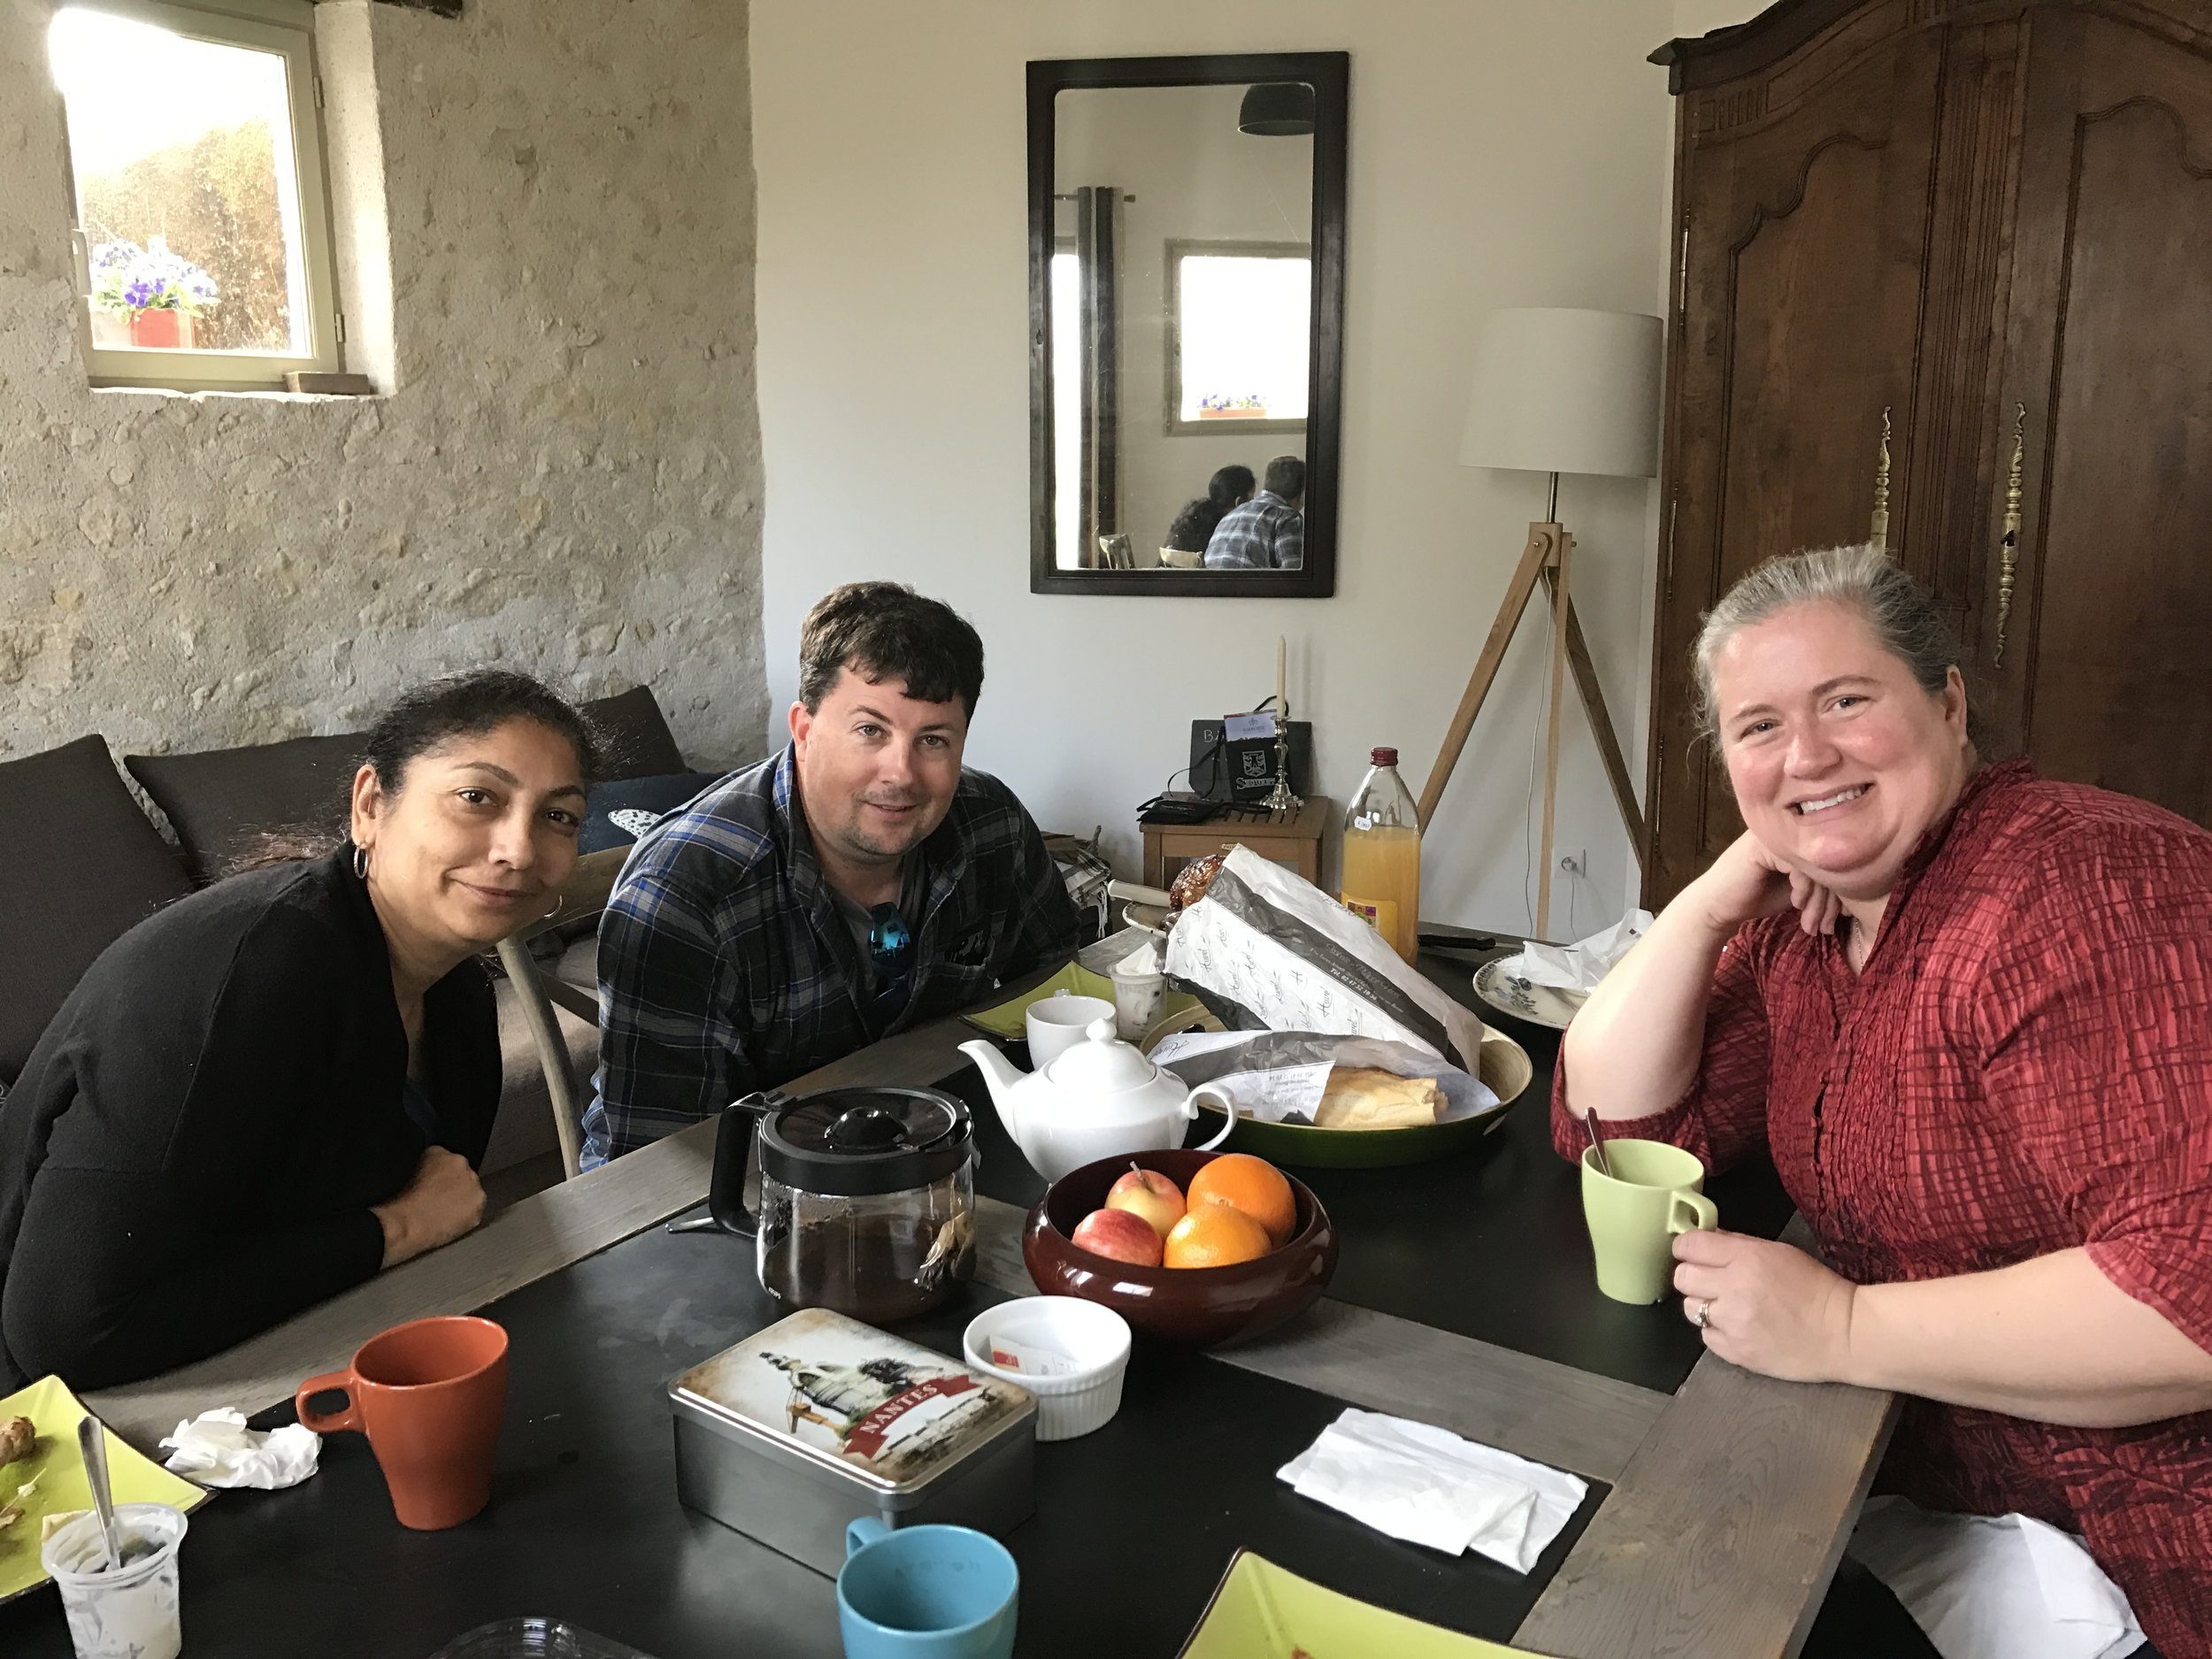 Shaka, Laura, and Jeff at breakfast